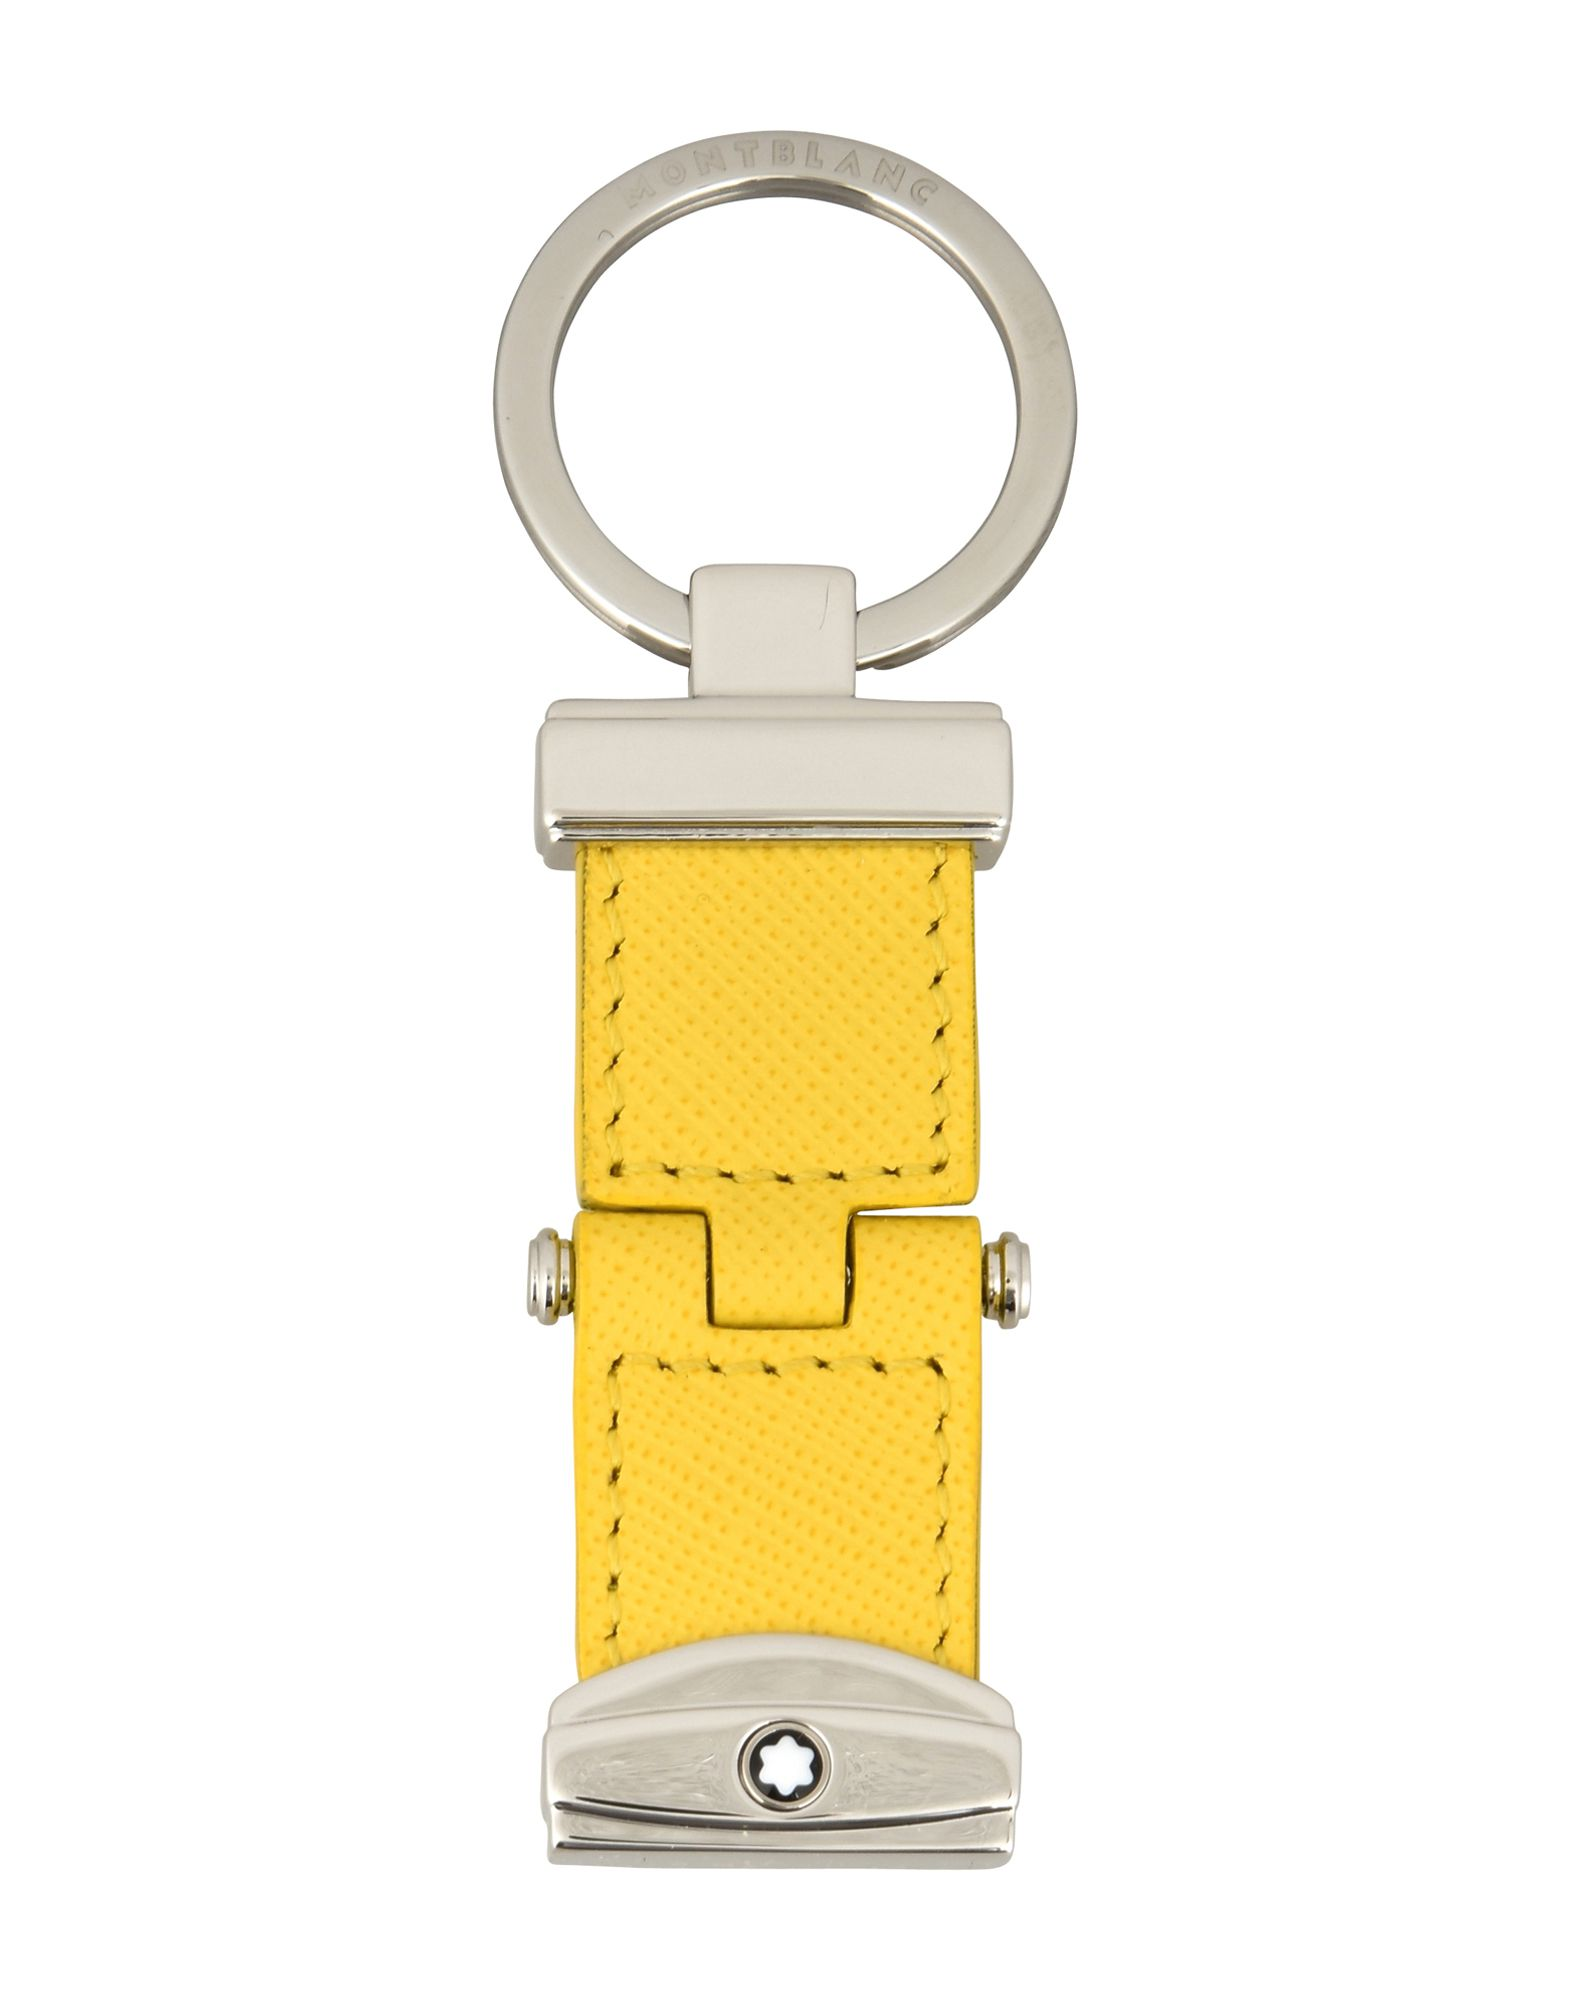 MONTBLANC Брелок для ключей maker and sons брелок для ключей